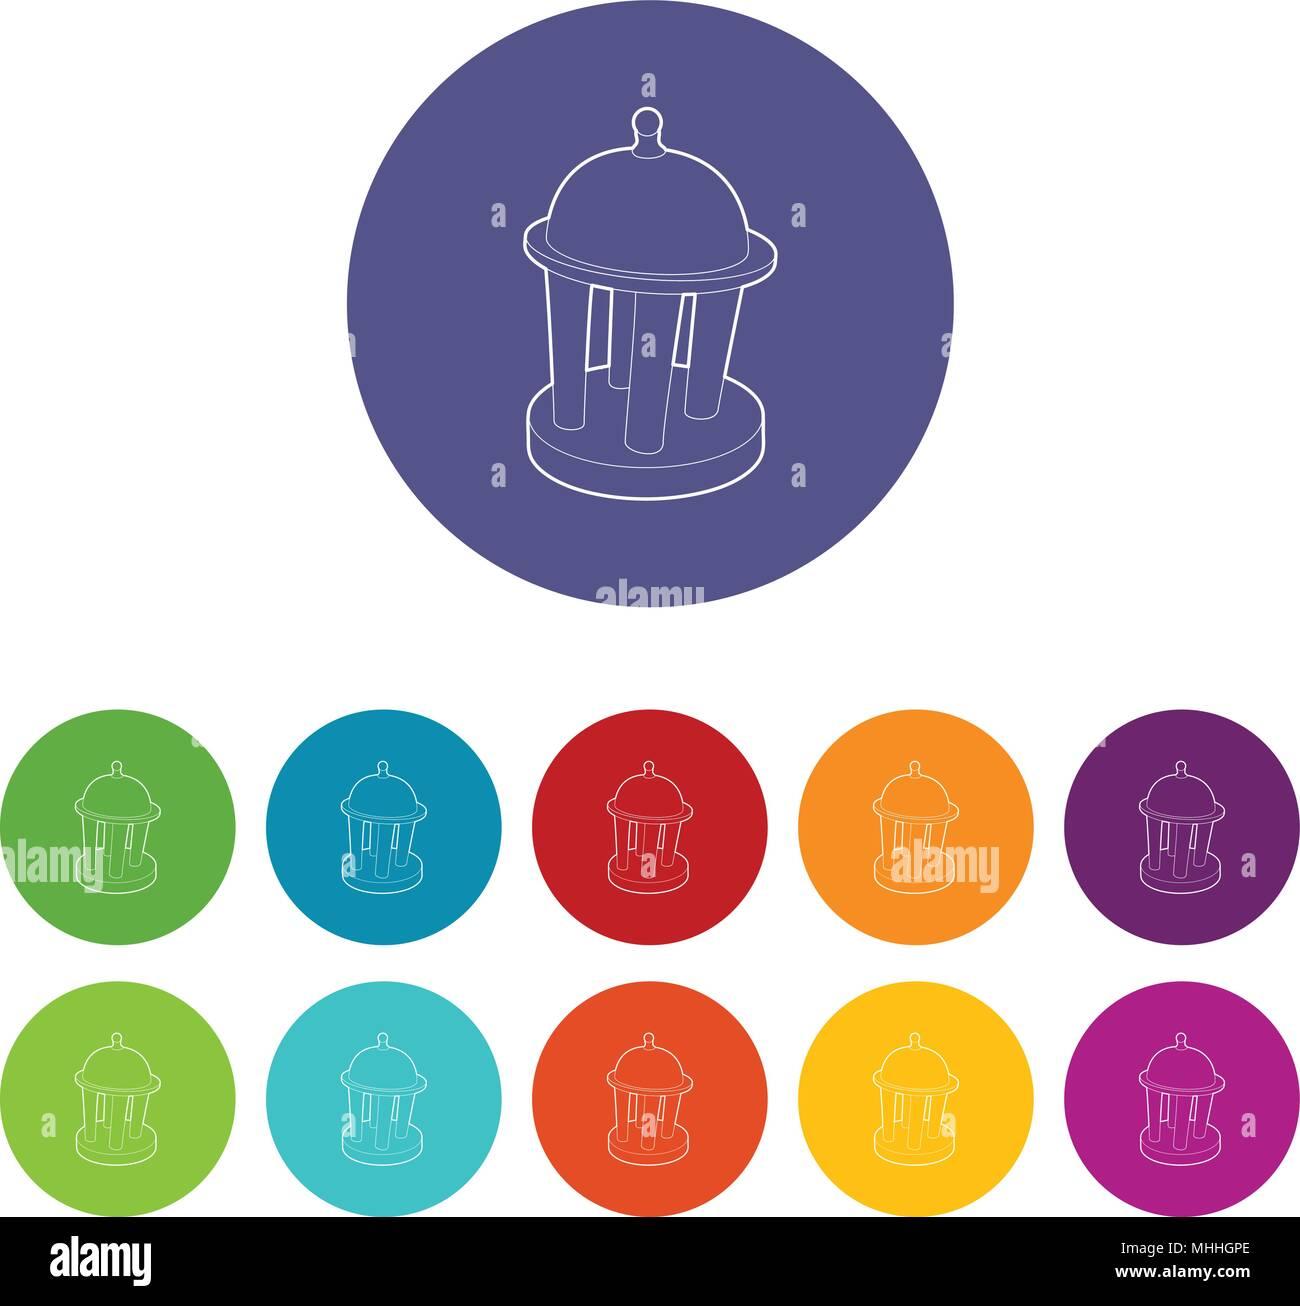 Rotunda icon, outline style - Stock Vector